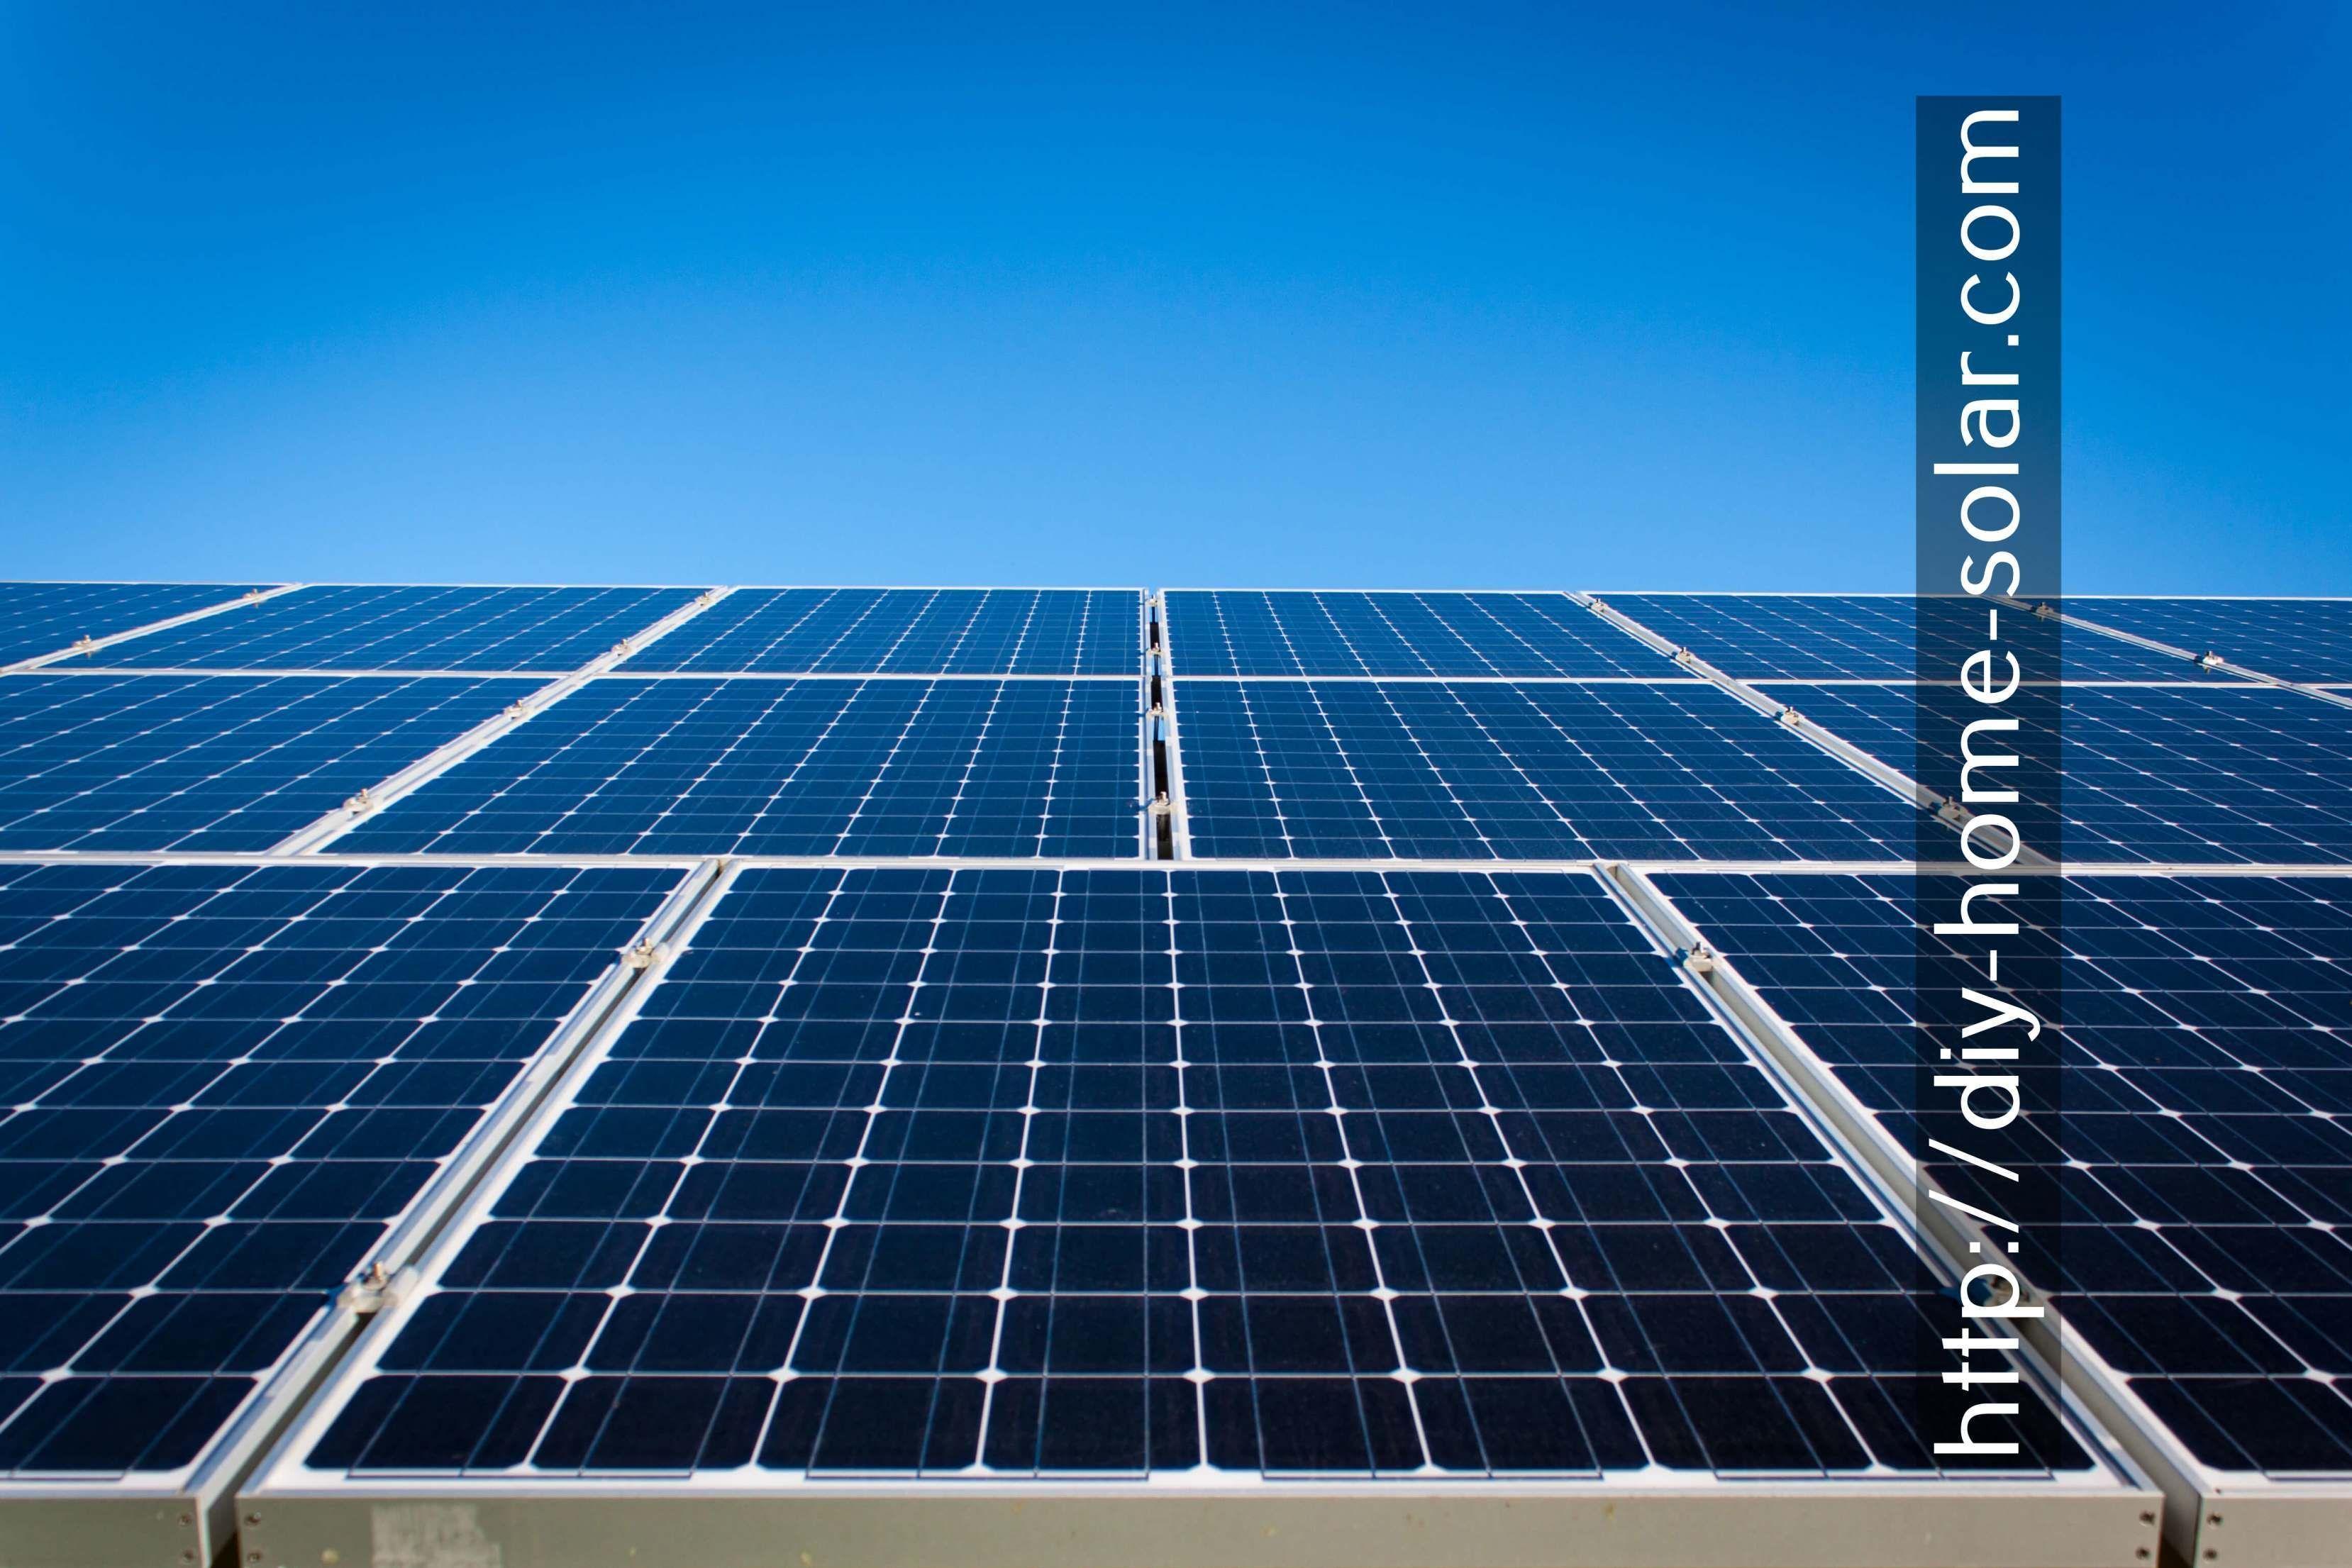 Make Solar Cell At Home Suntech Solar Panels Solar Panel Grants 7790032325 Beekeepinggrants Homesolarpanels Solar Panels Buy Solar Panels Solar Power House